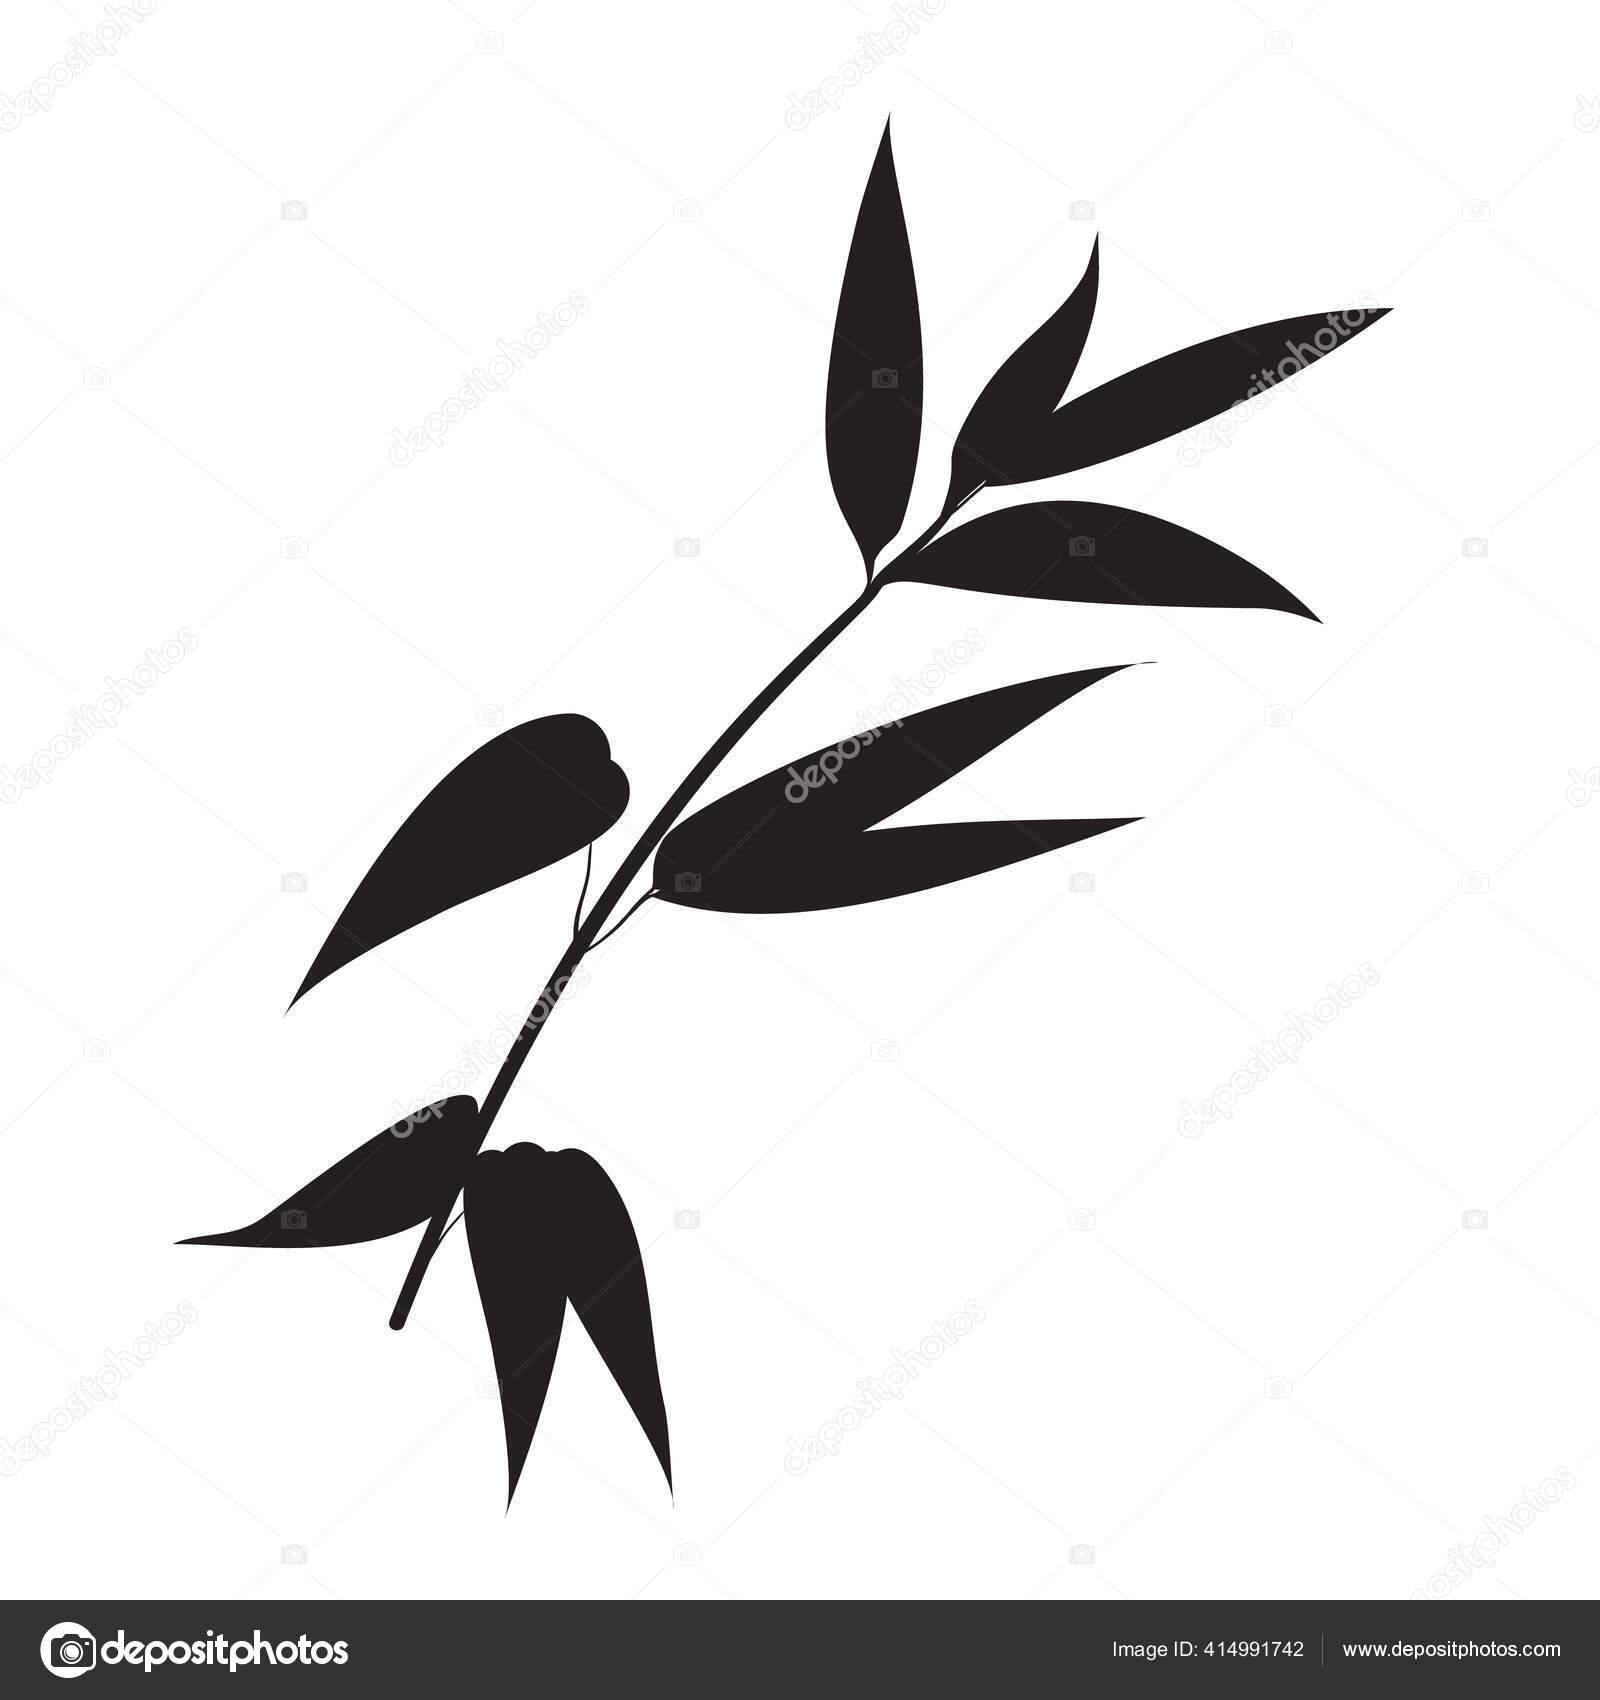 tangan digambar cabang bambu untuk desain anda stok vektor c kotkoa 414991742 depositphotos